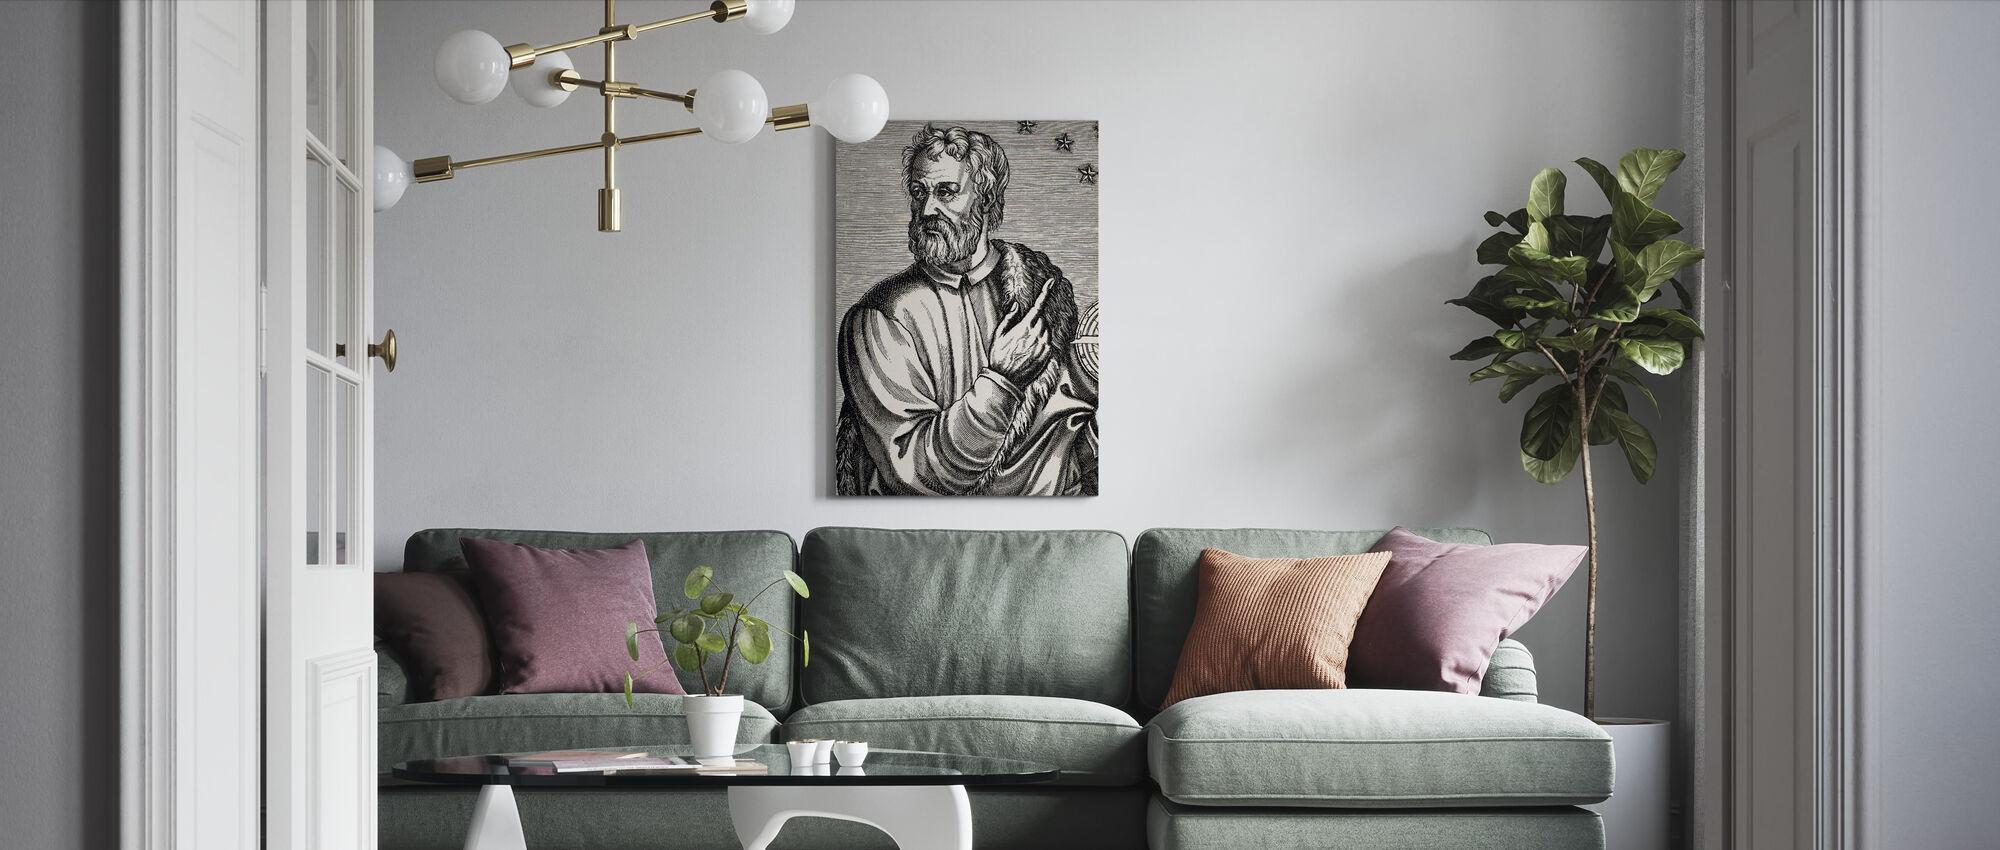 Christopher Kolumbus - Canvastaulu - Olohuone